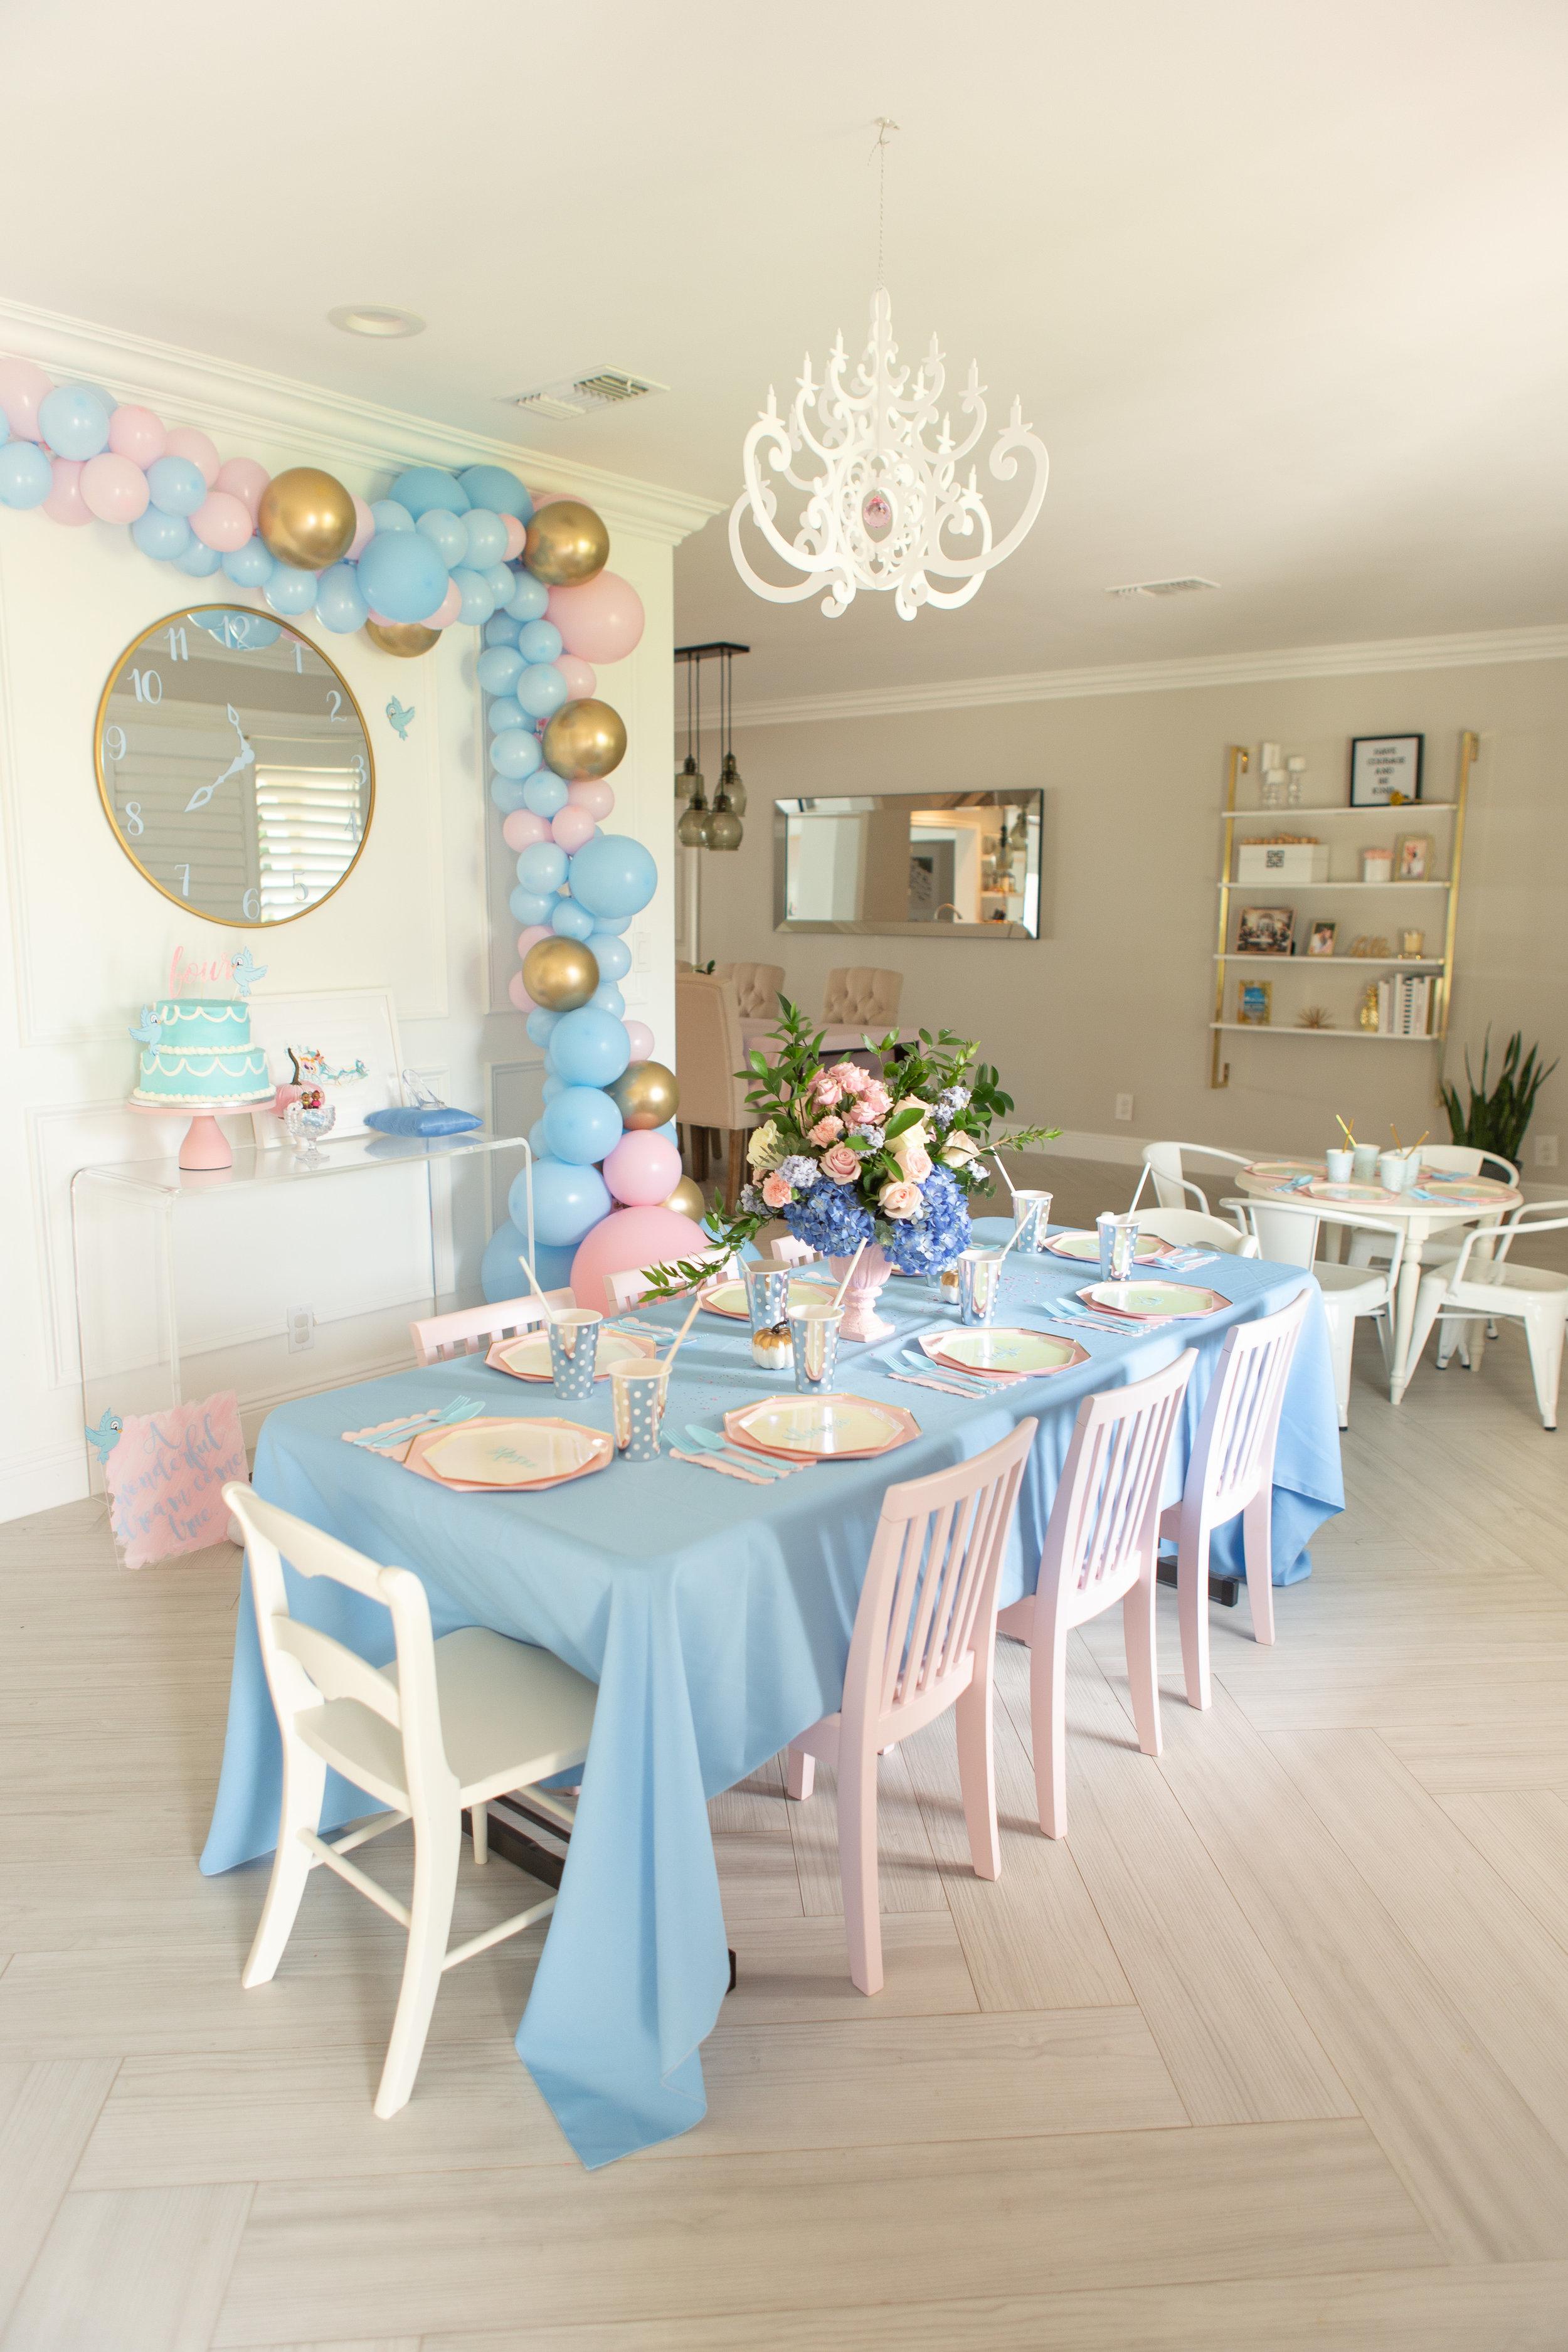 CB Liliah's Party-50.jpg